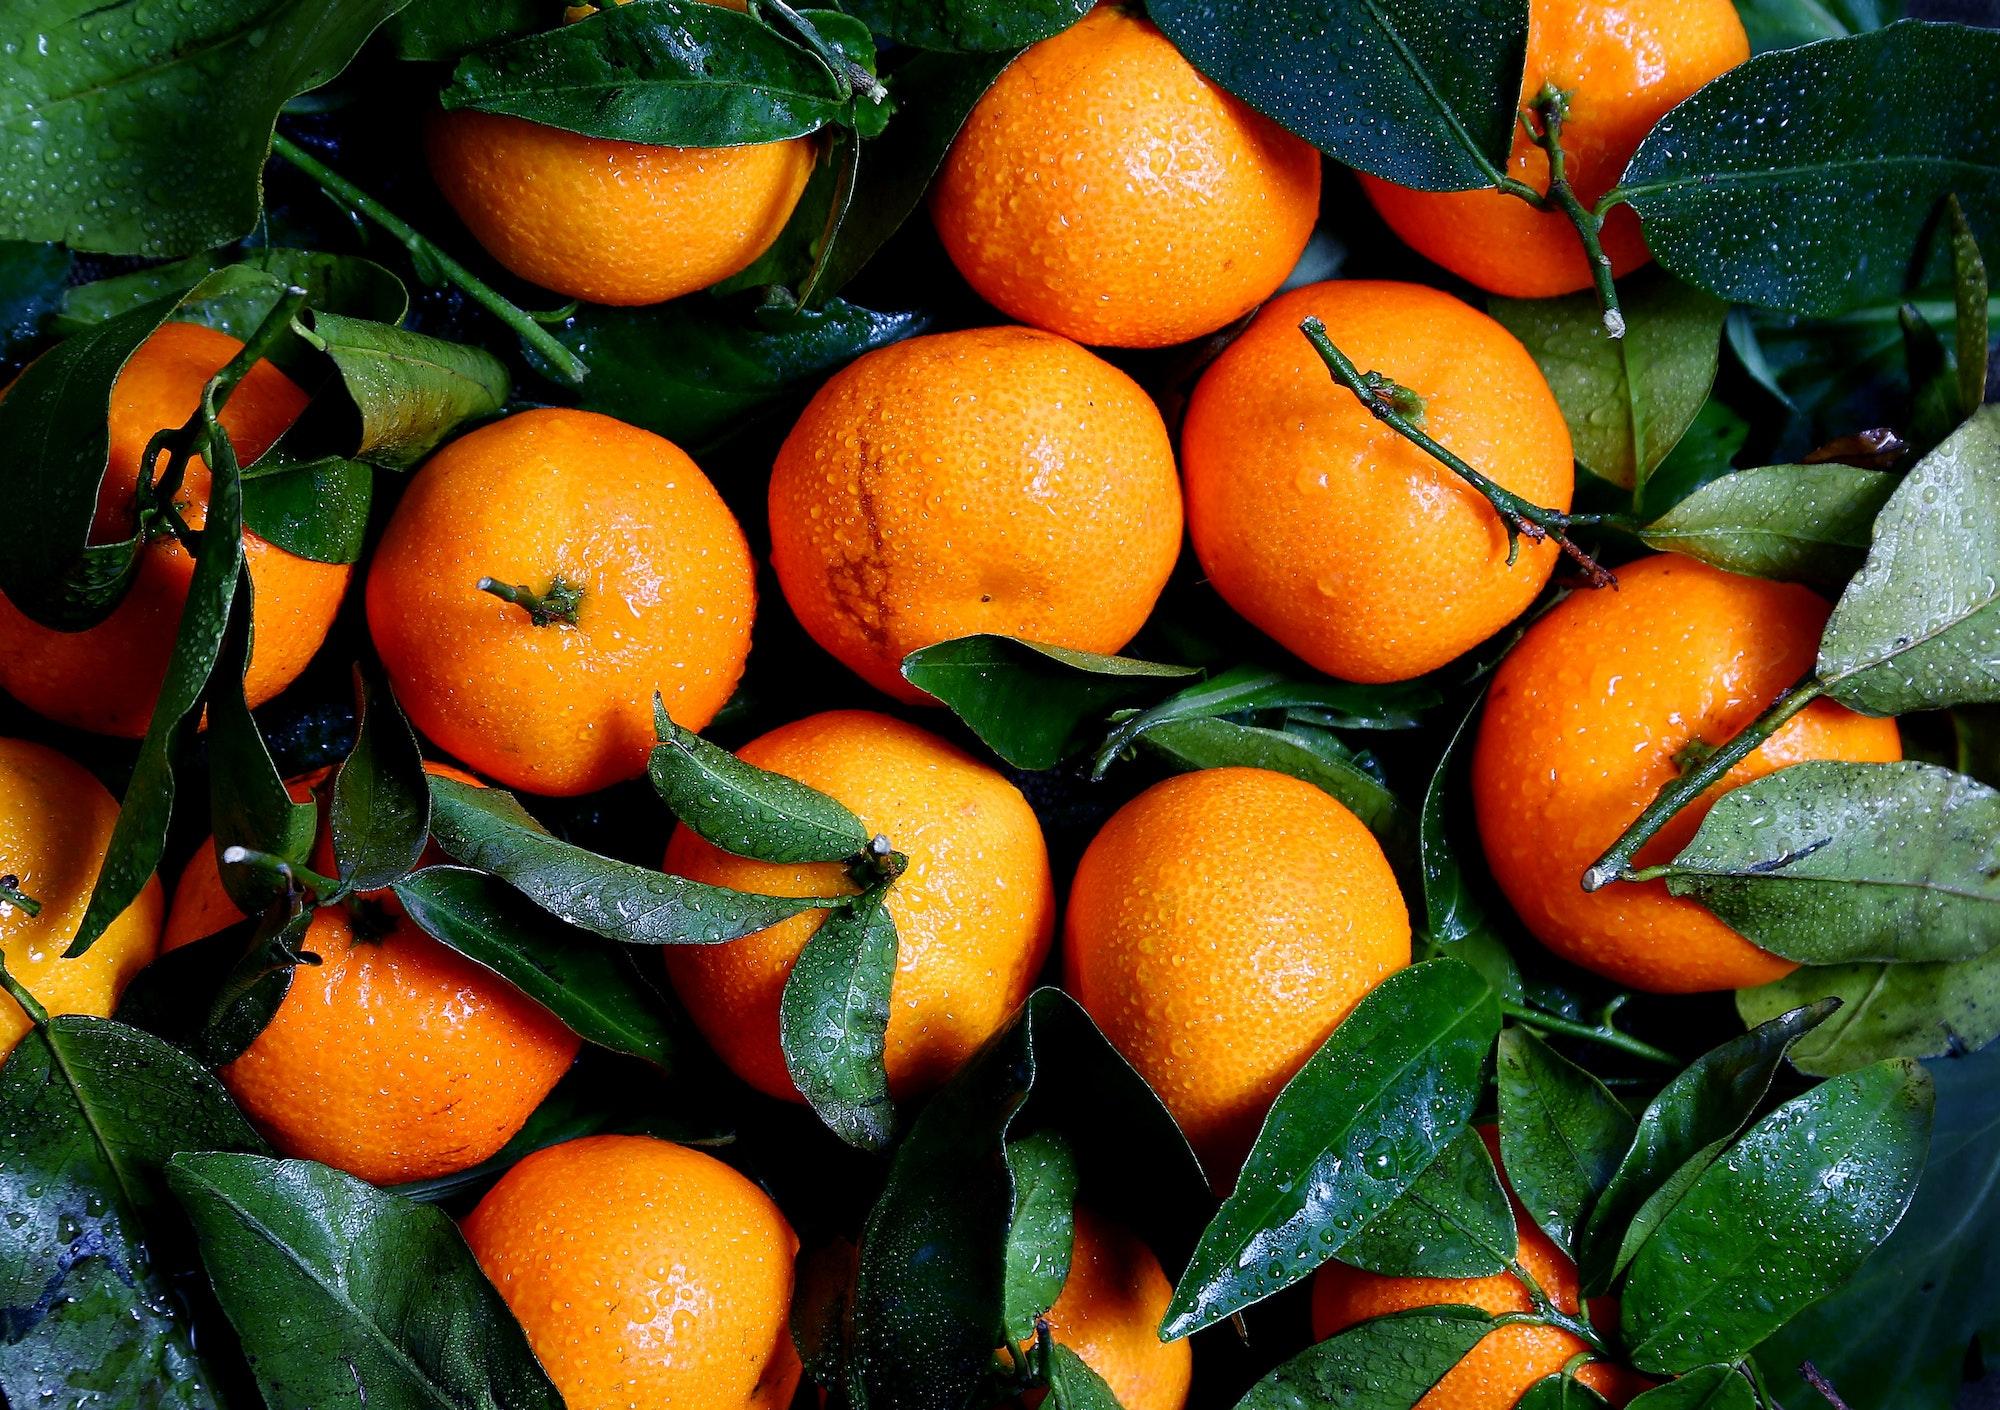 May contain: citrus fruit, plant, fruit, food, orange, grapefruit, and produce